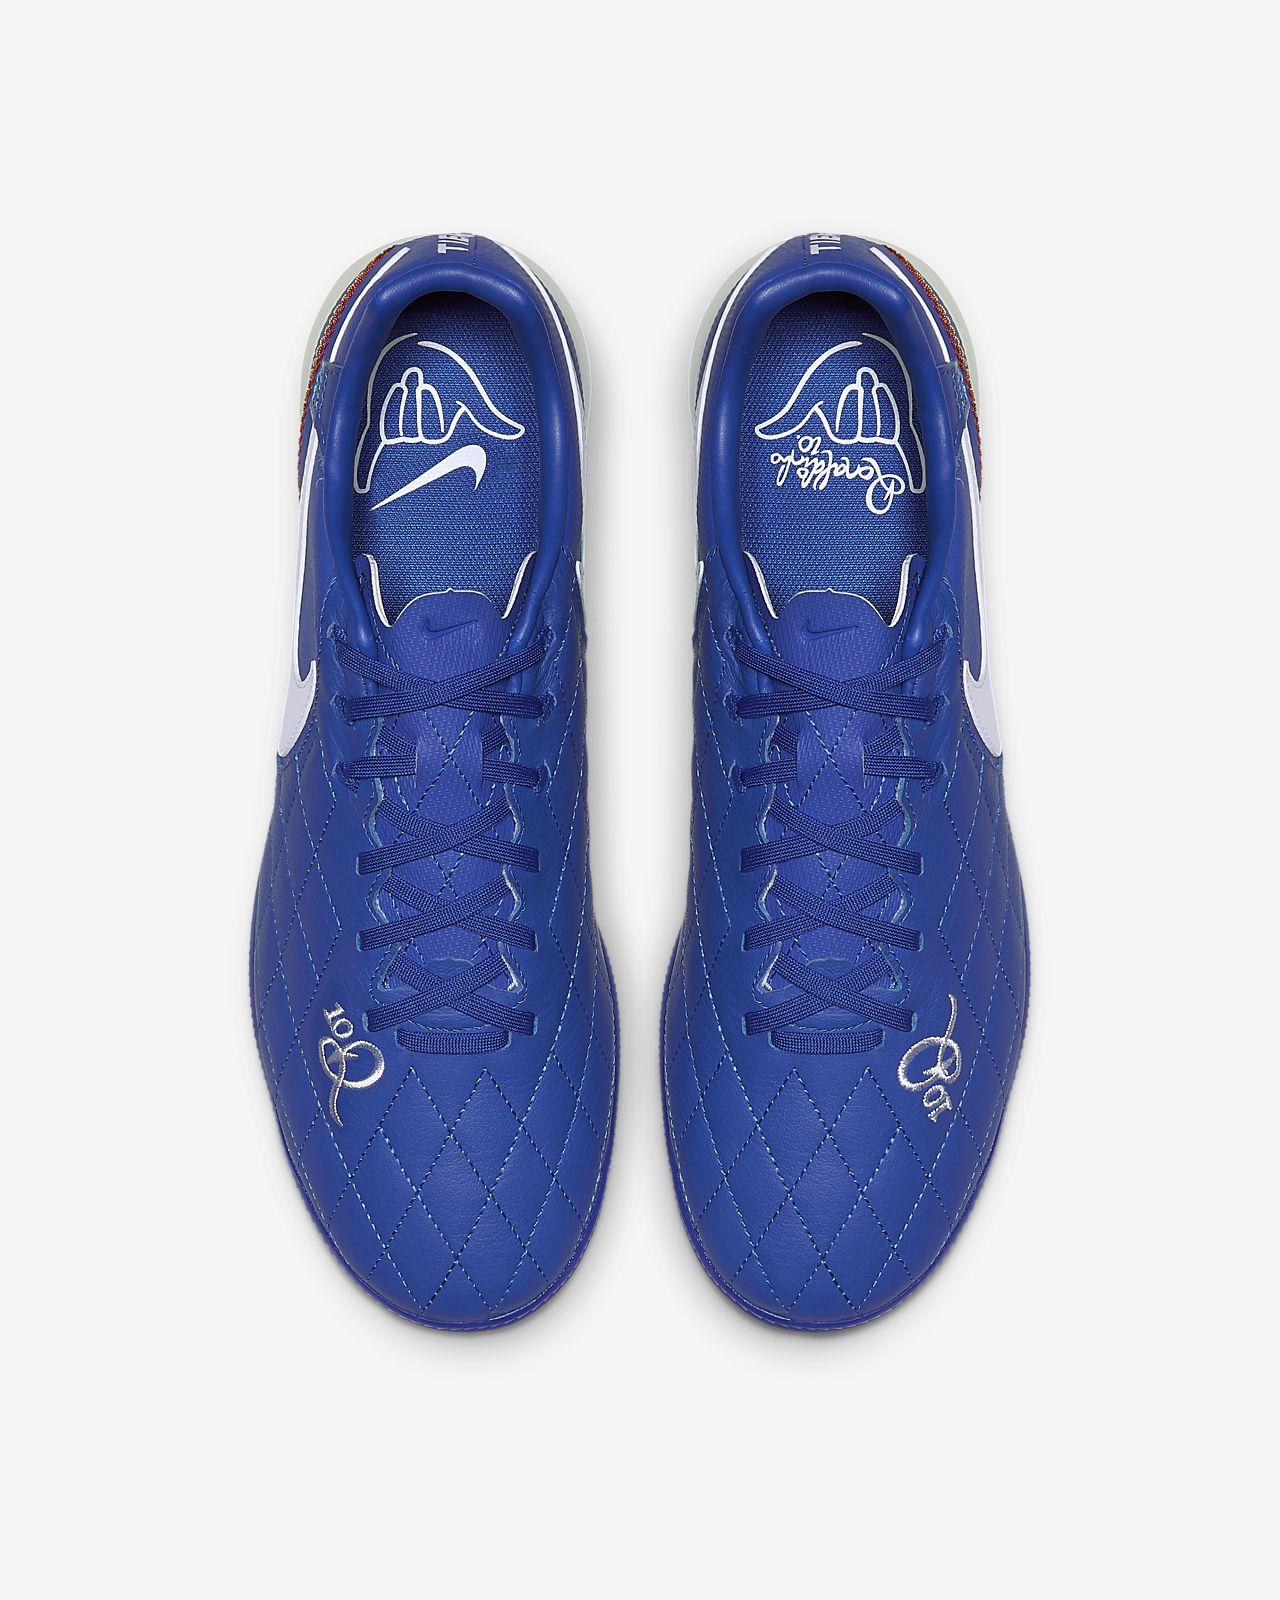 ... Nike TiempoX Lunar Legend VII Pro 10R Botas de fútbol para hierba  artificial o moqueta - 7dbb519eb0d44